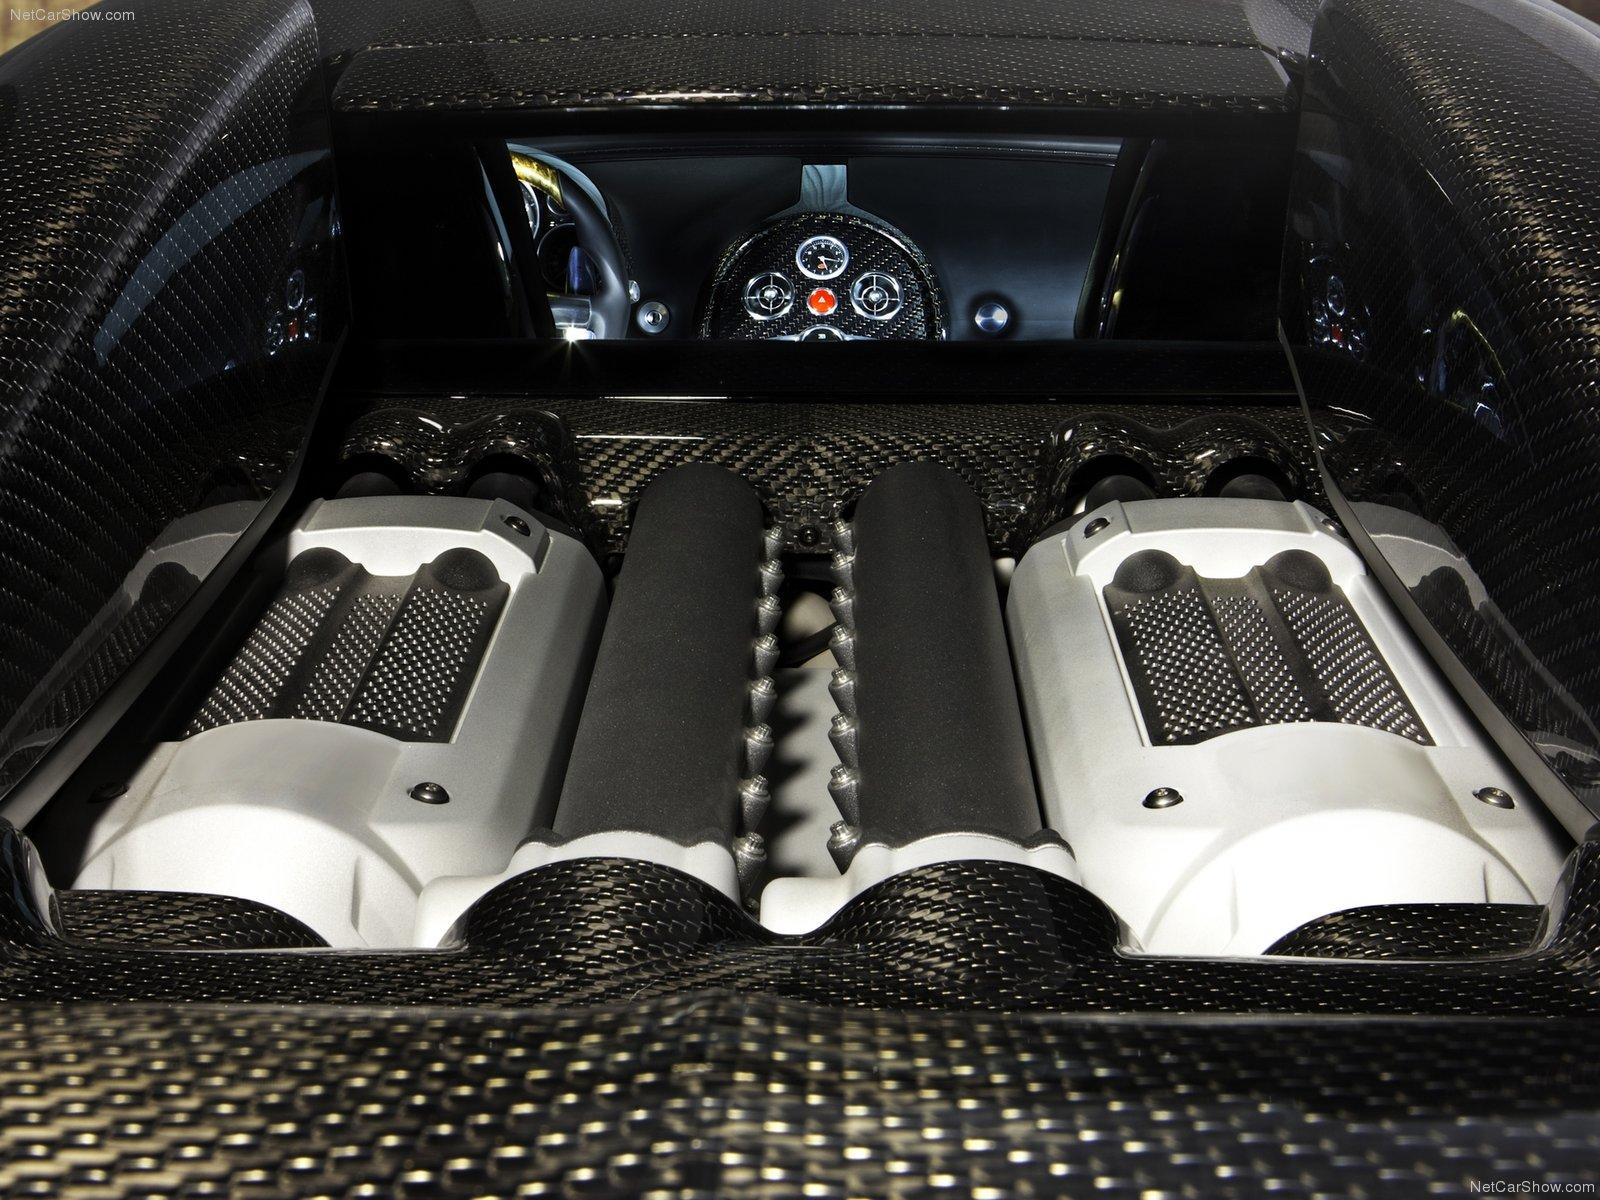 http://3.bp.blogspot.com/_cLWqMZQ1CPk/TUBZWWS8x7I/AAAAAAAAGp0/T_T47qca7ac/s1600/Mansory-Bugatti_Veyron_Linea_Vincero_dOro_2010_1600x1200_wallpaper_12.jpg